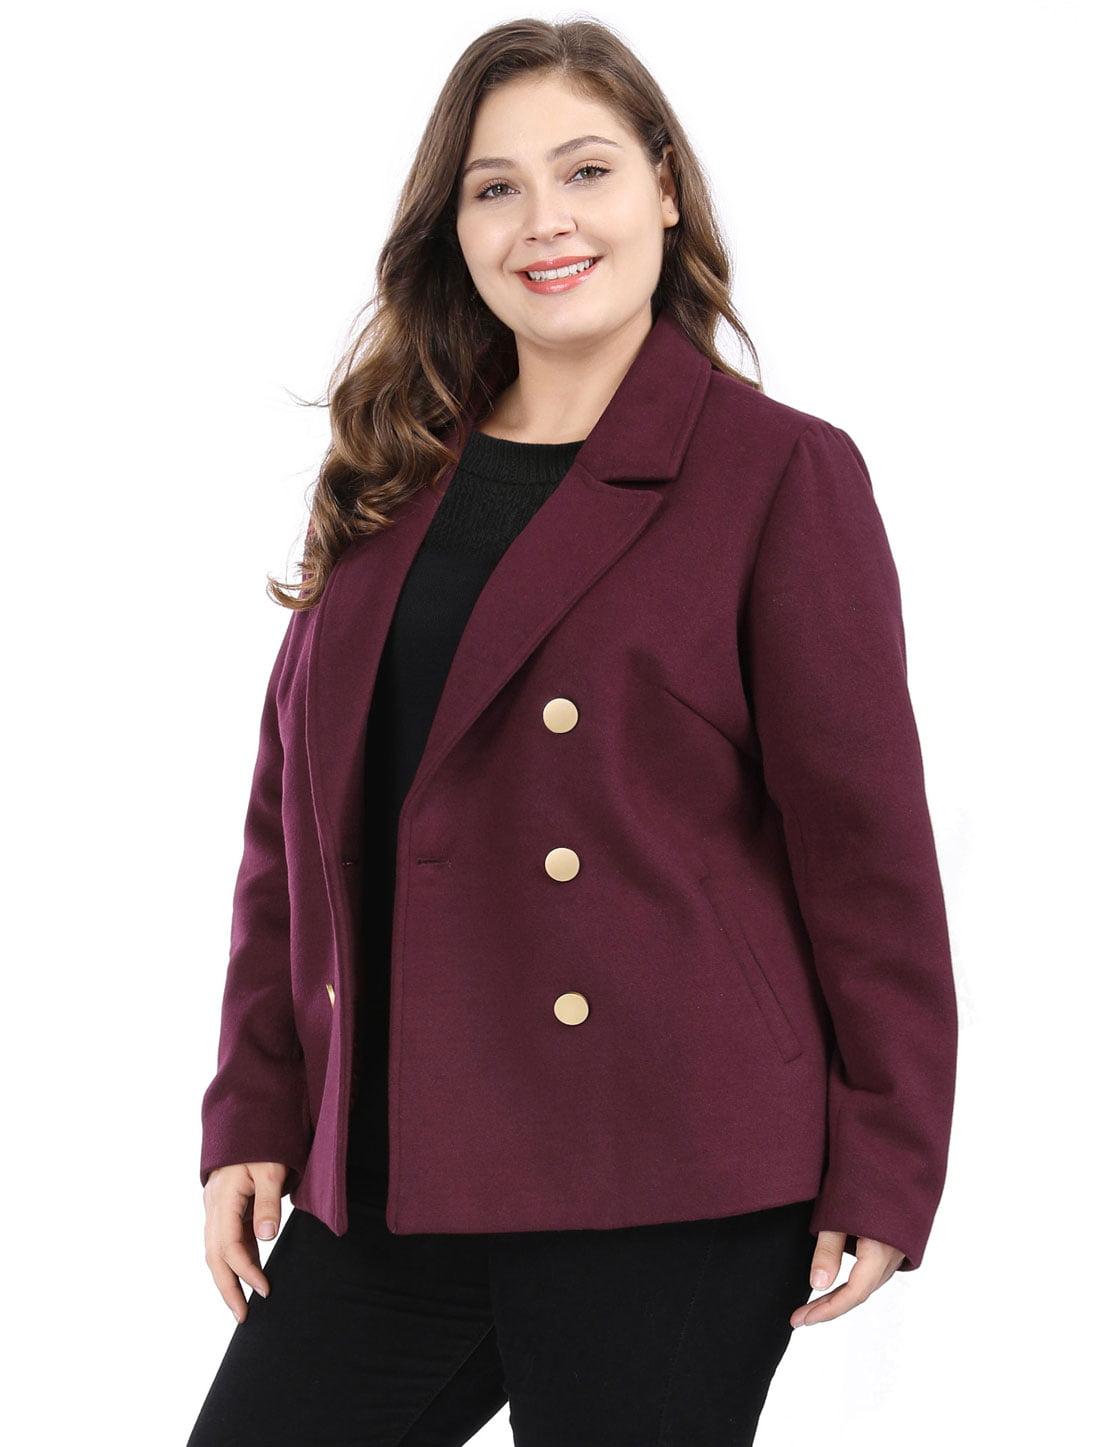 cfeacab3bf1 Unique Bargains - Women s Plus Size Notched Lapel Winter Peacoat Double  Breasted Notched Lapel Coat Red 3X - Walmart.com